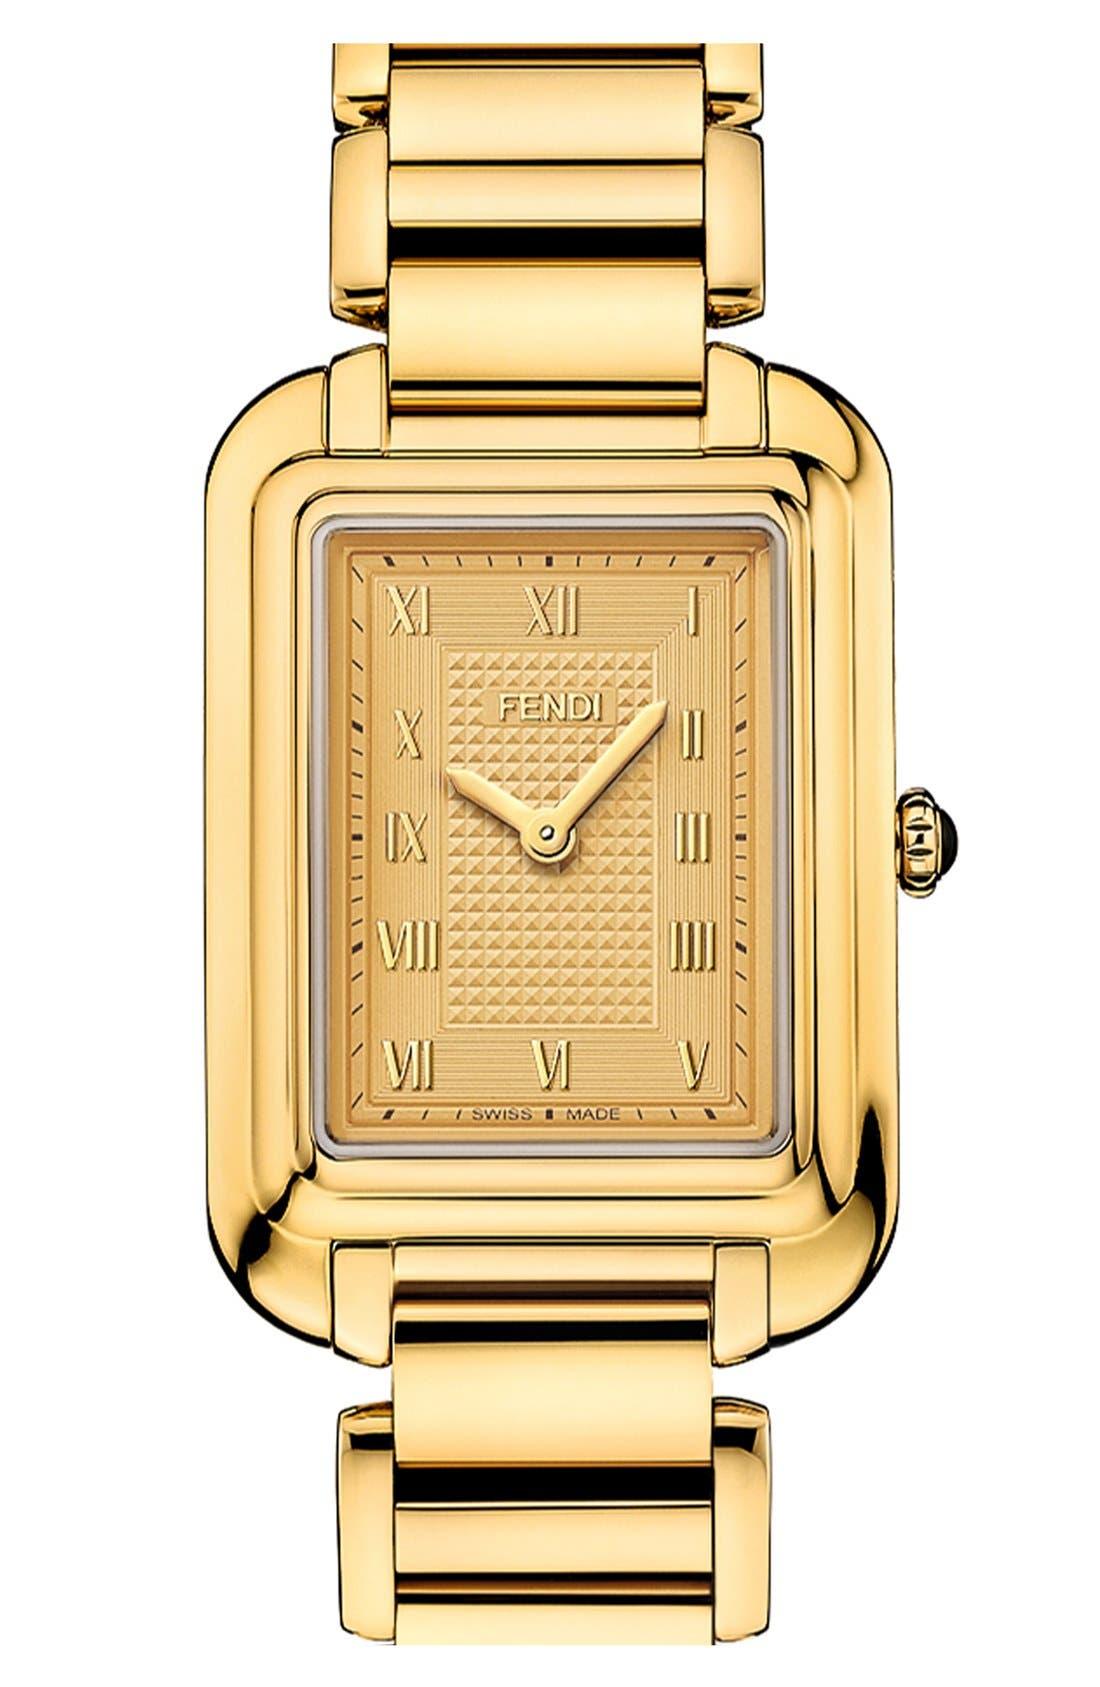 Main Image - Fendi 'Classico' Rectangular Bracelet Watch, 25mm x 36mm